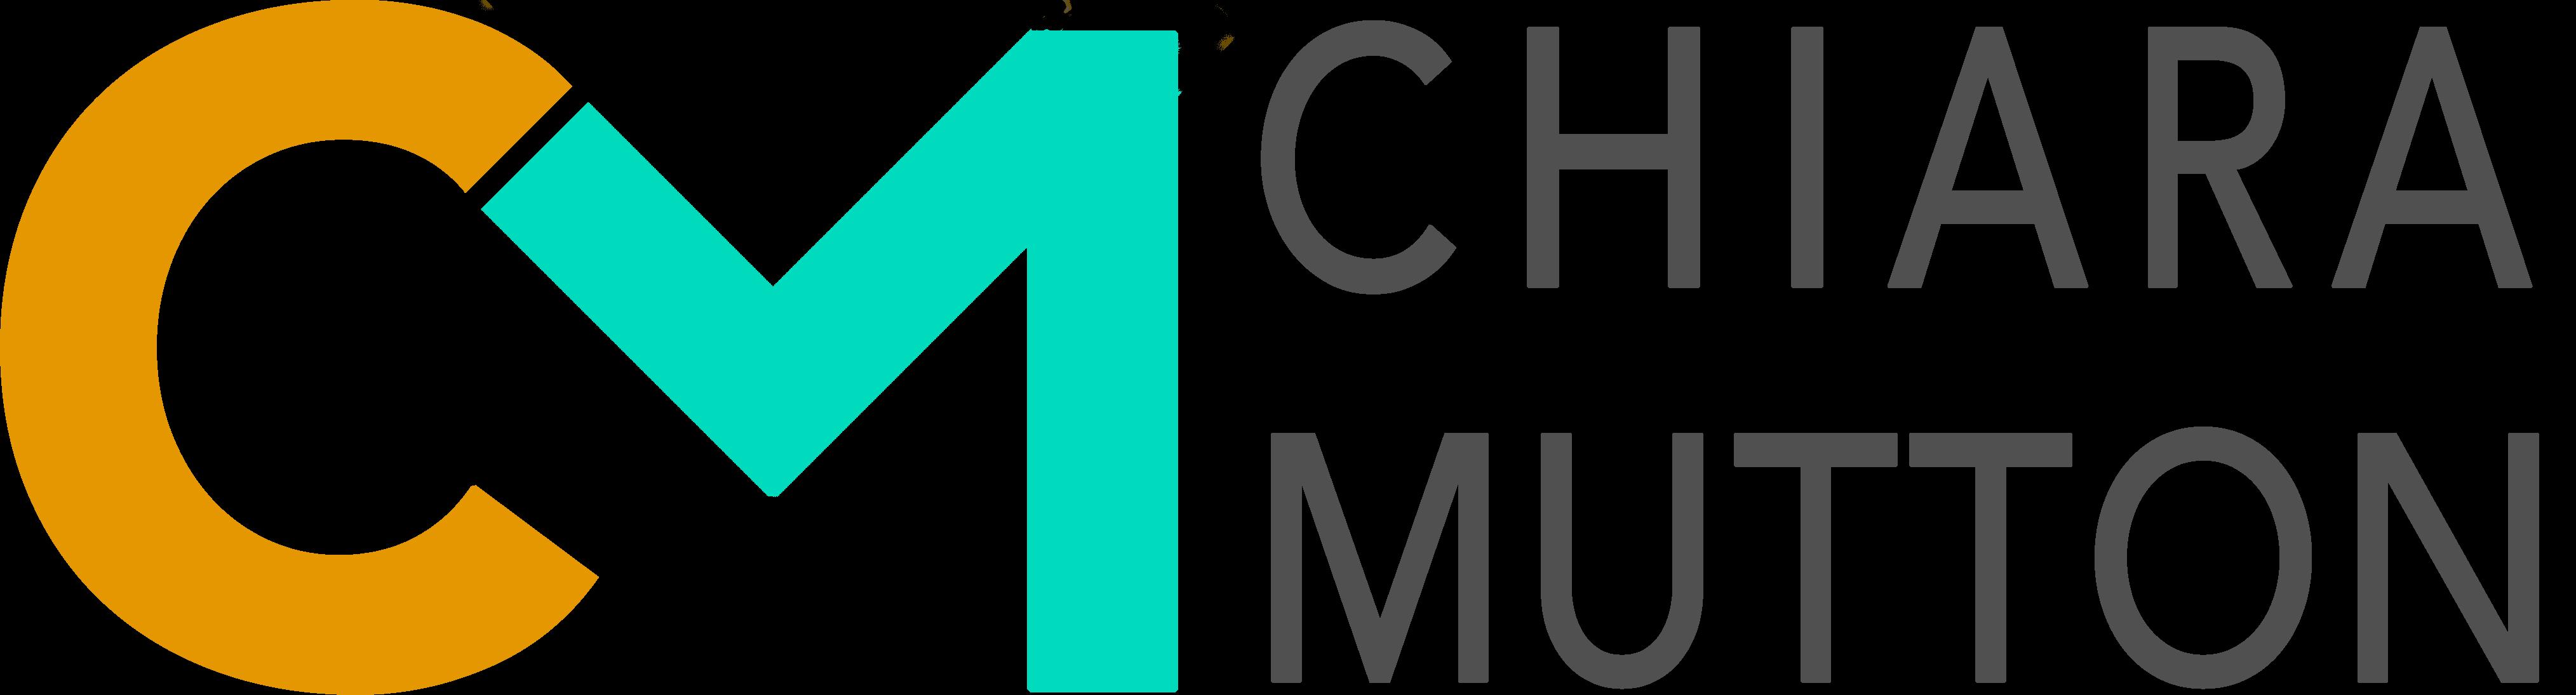 Chiara Mutton